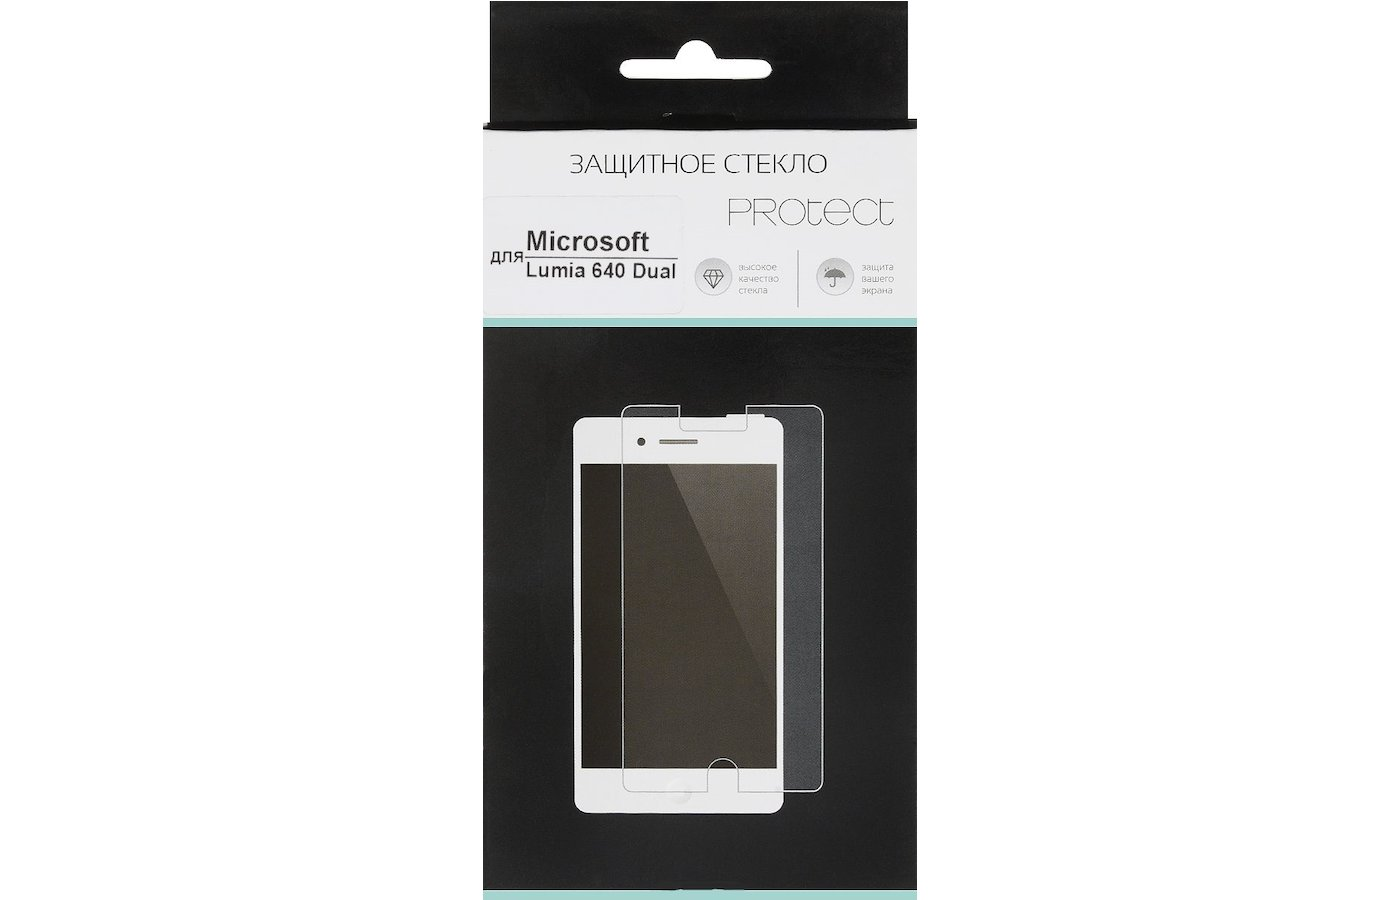 Стекло Protect пленка для Microsoft Lumia 640 Dual